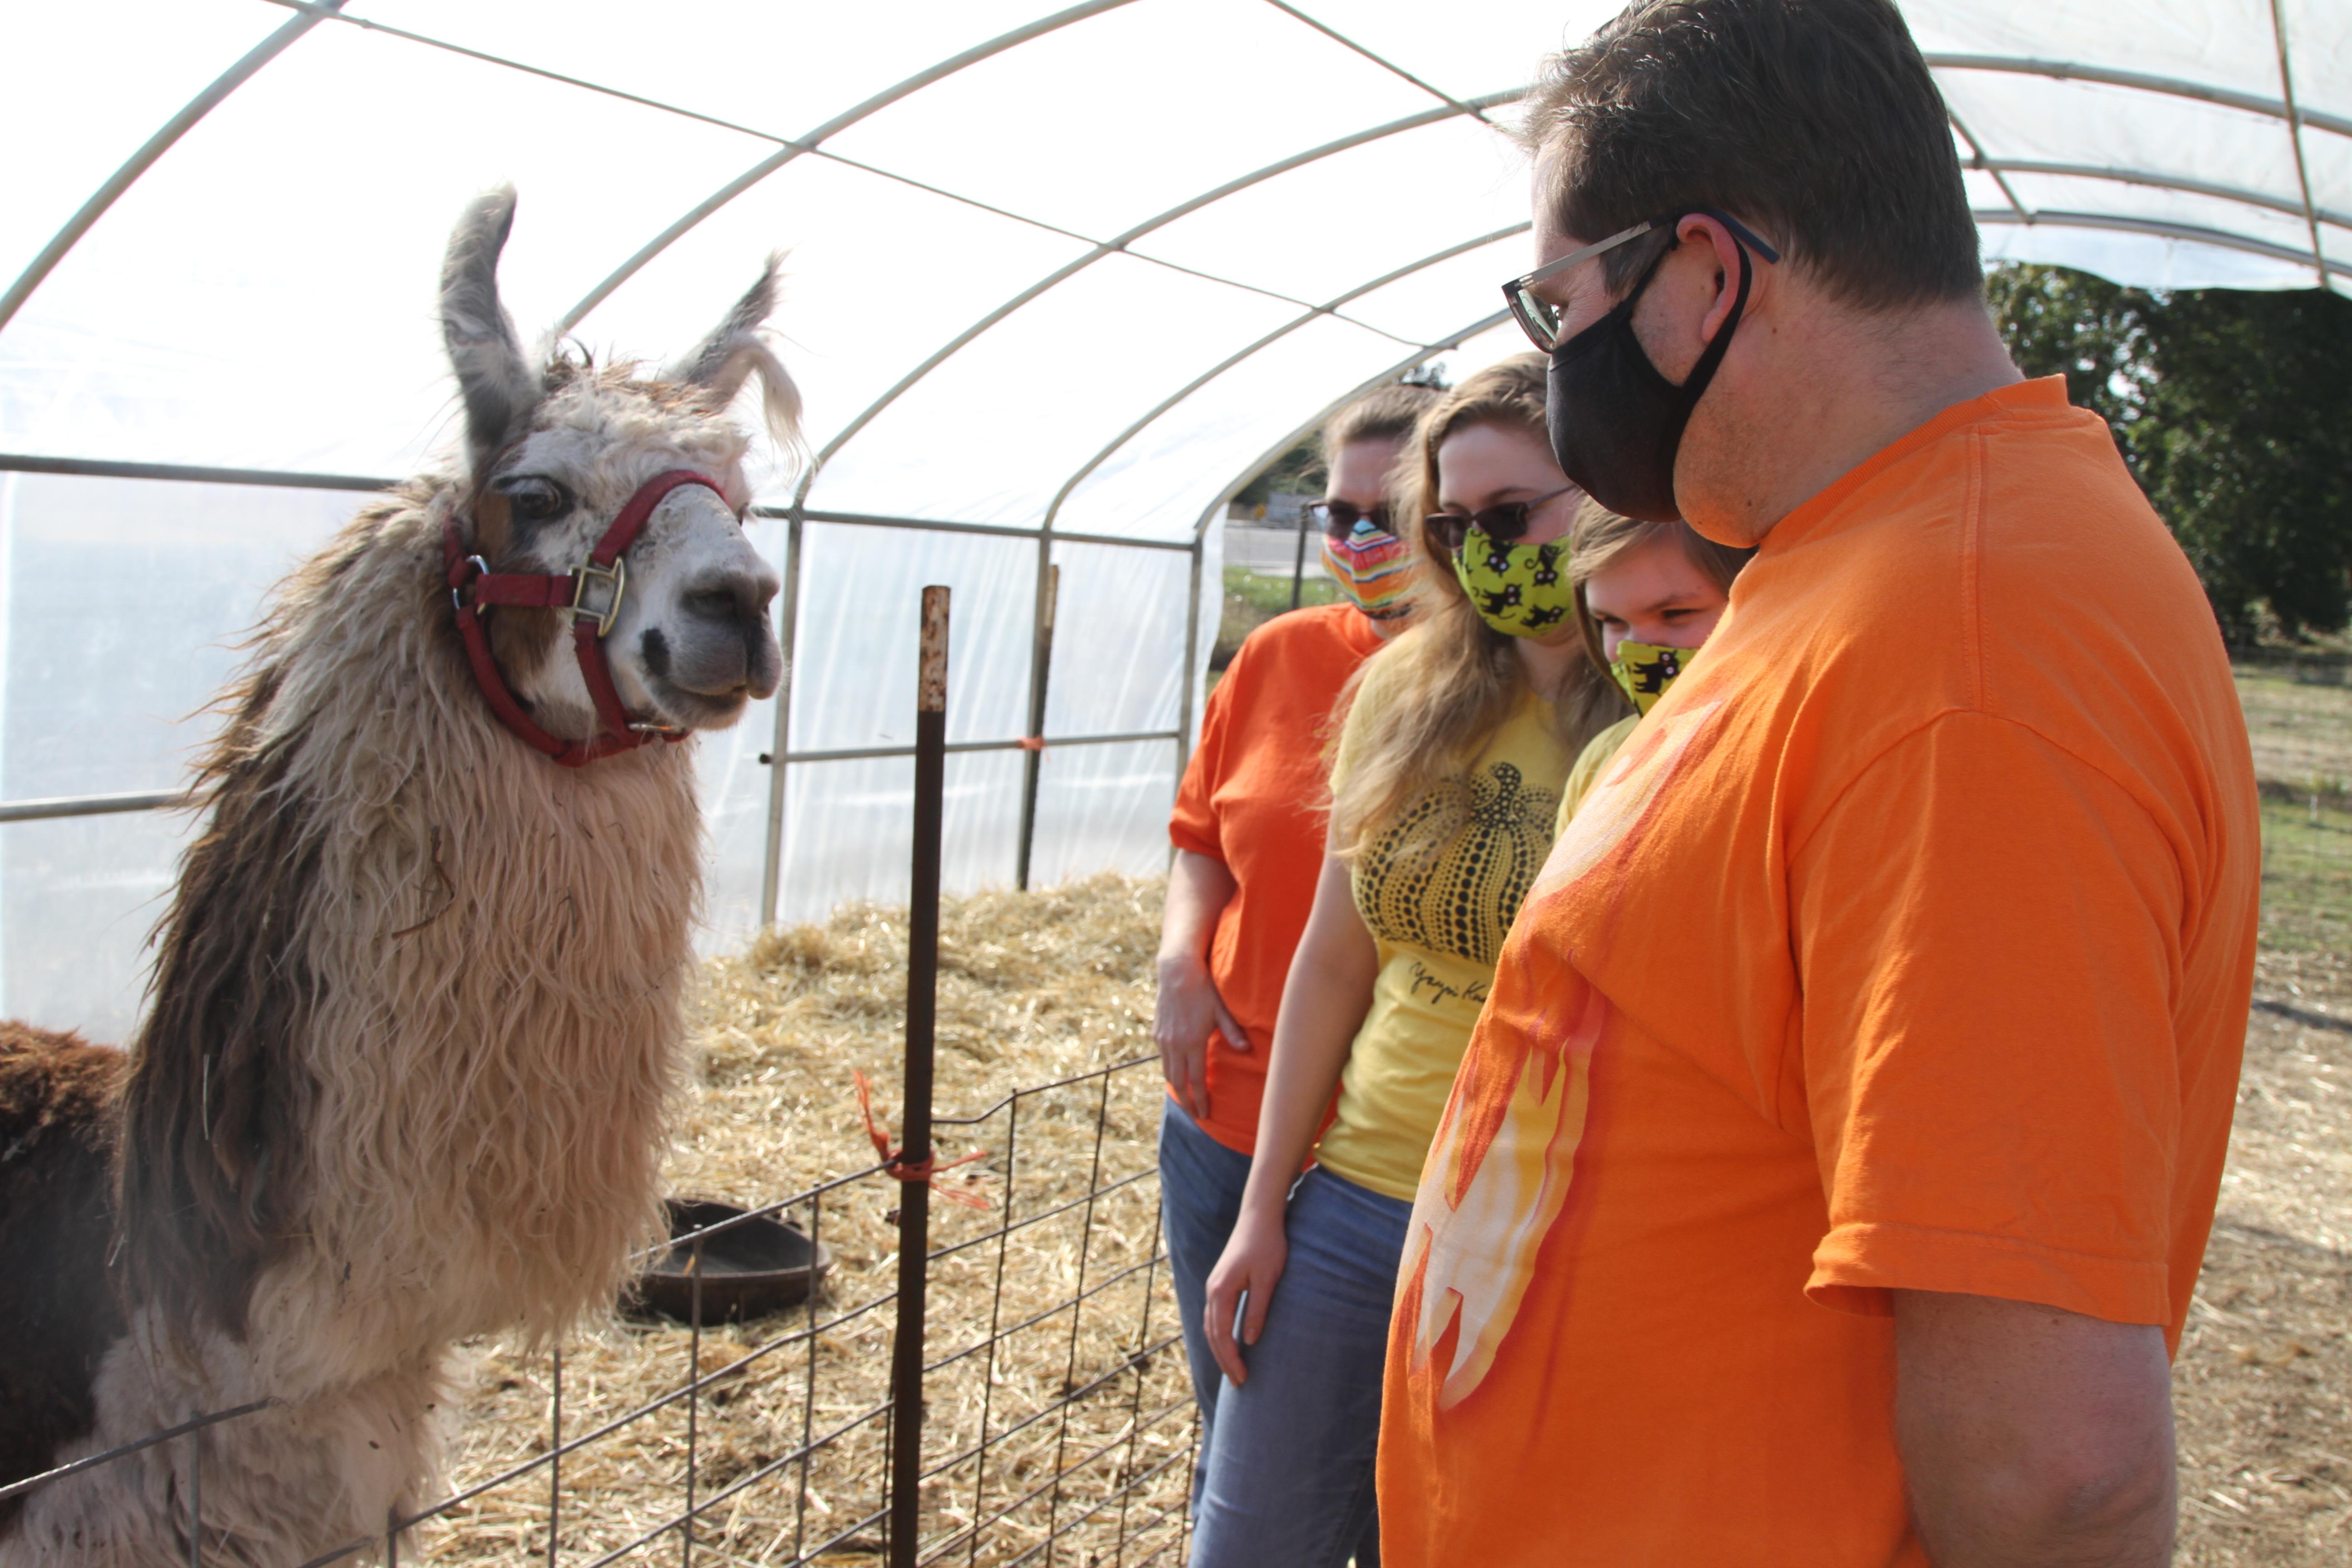 Jeremy, Annabelle, Juliette and Kristie Hauss meet the llama at an acceptable social distance at Bi-Zi Farms pumpkin patch.